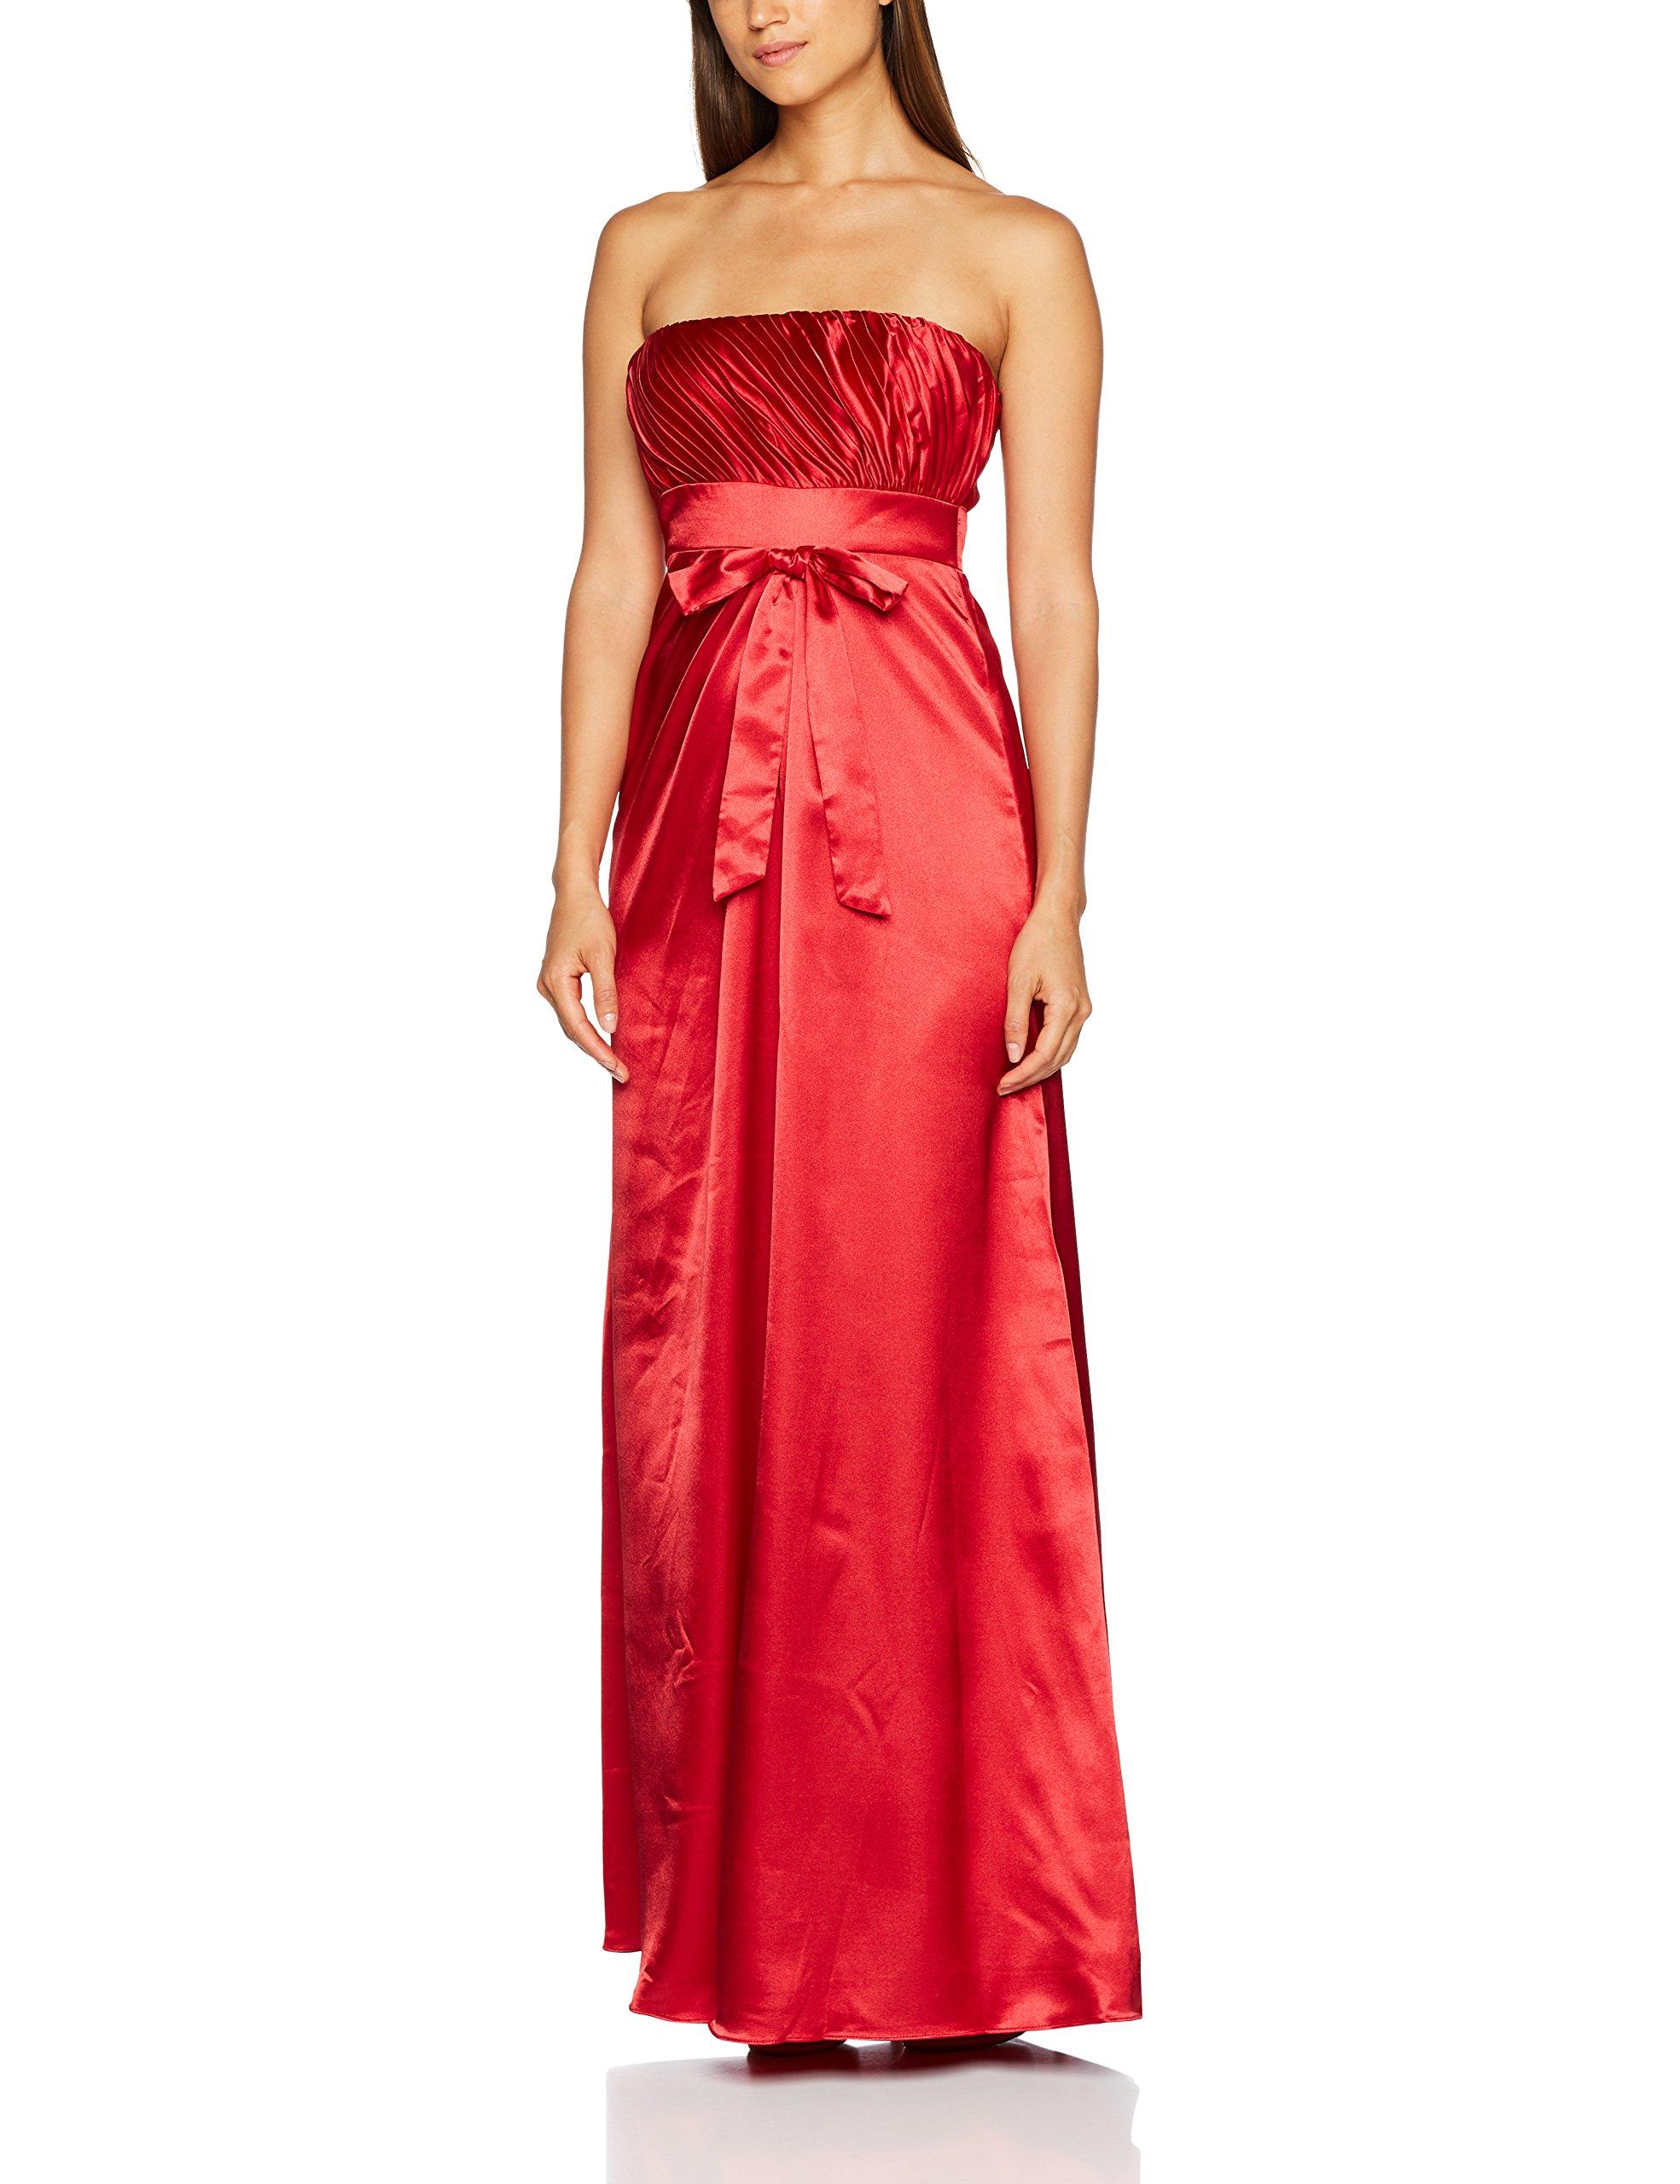 AstrapahlRobe Sans Femme Rouge Empire Taille 44 Manche VMUqzSp